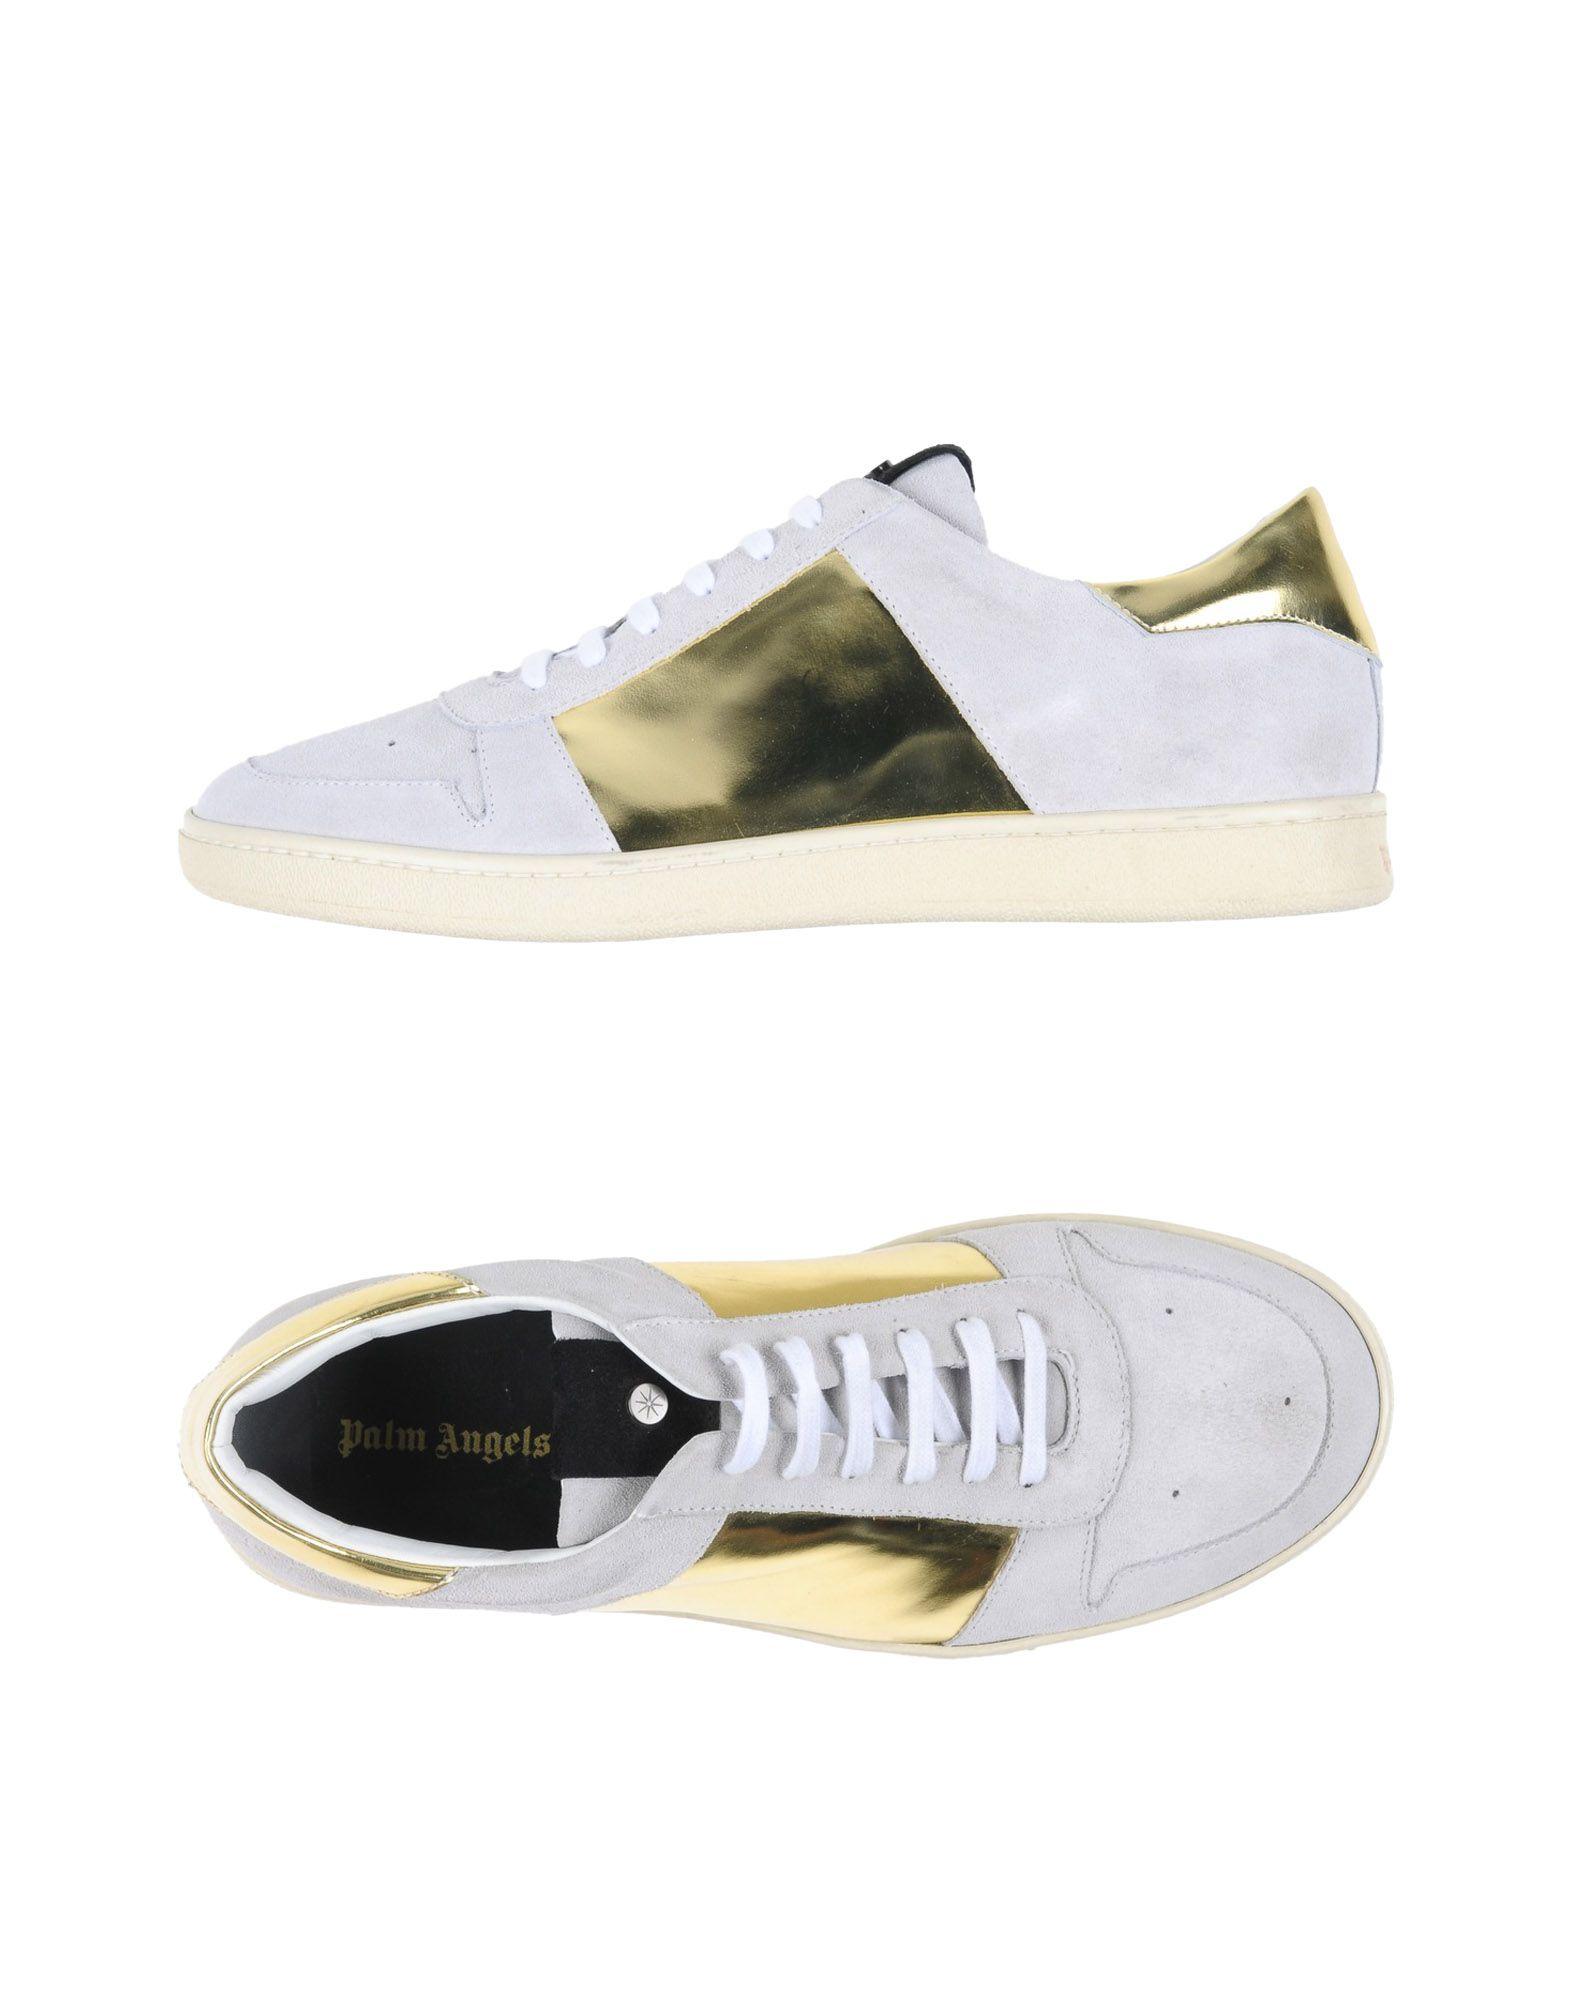 Sneakers Palm Angels Uomo - 11248687NG